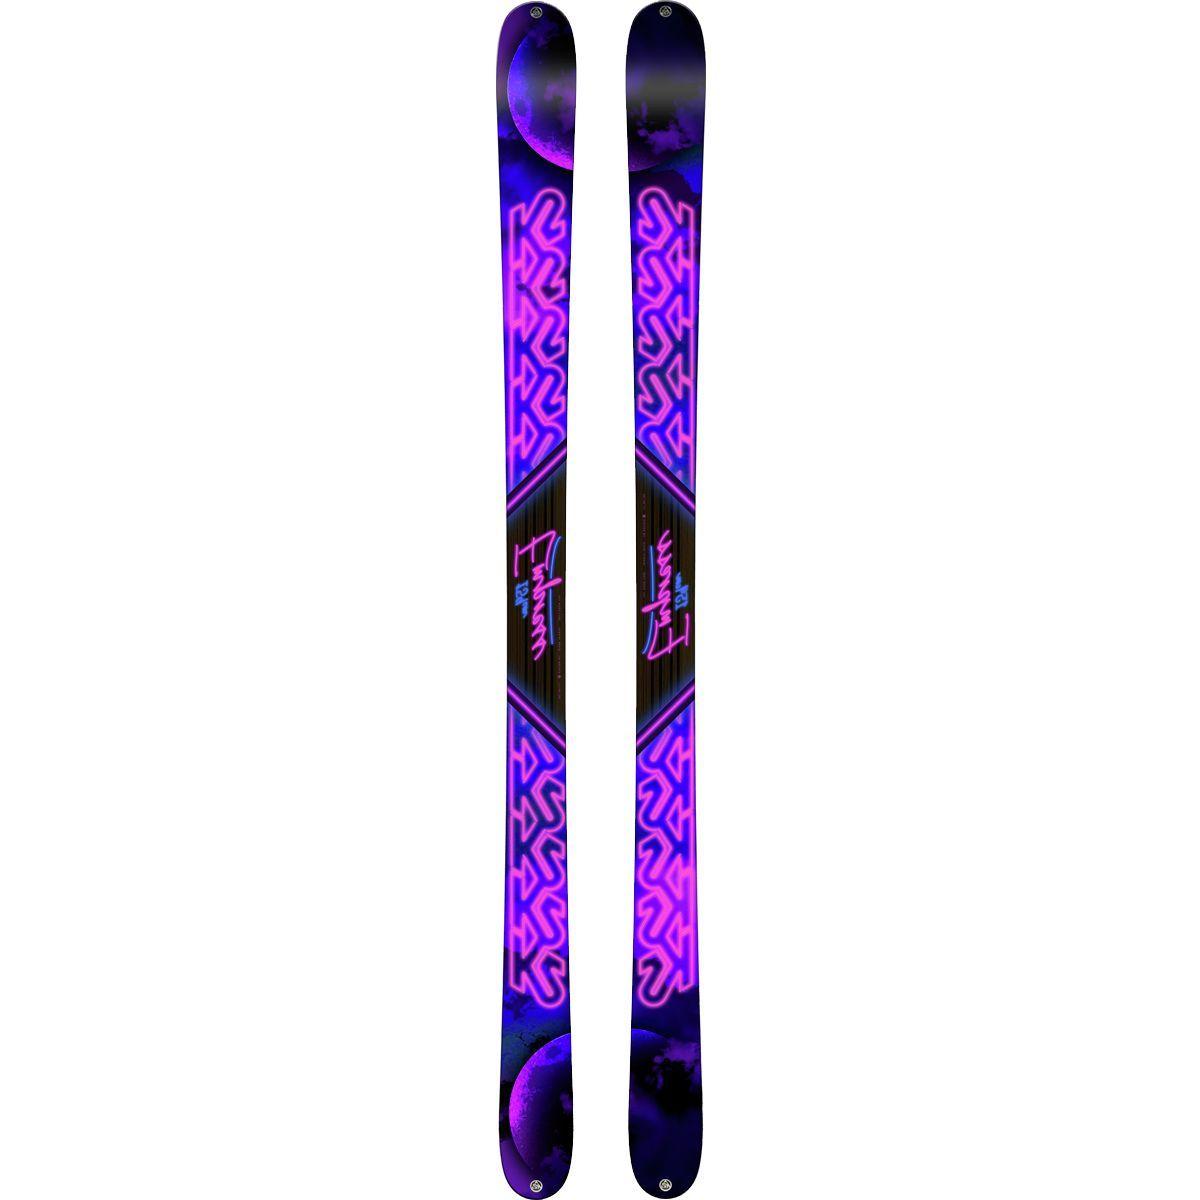 K2 Empress Ski - Women's